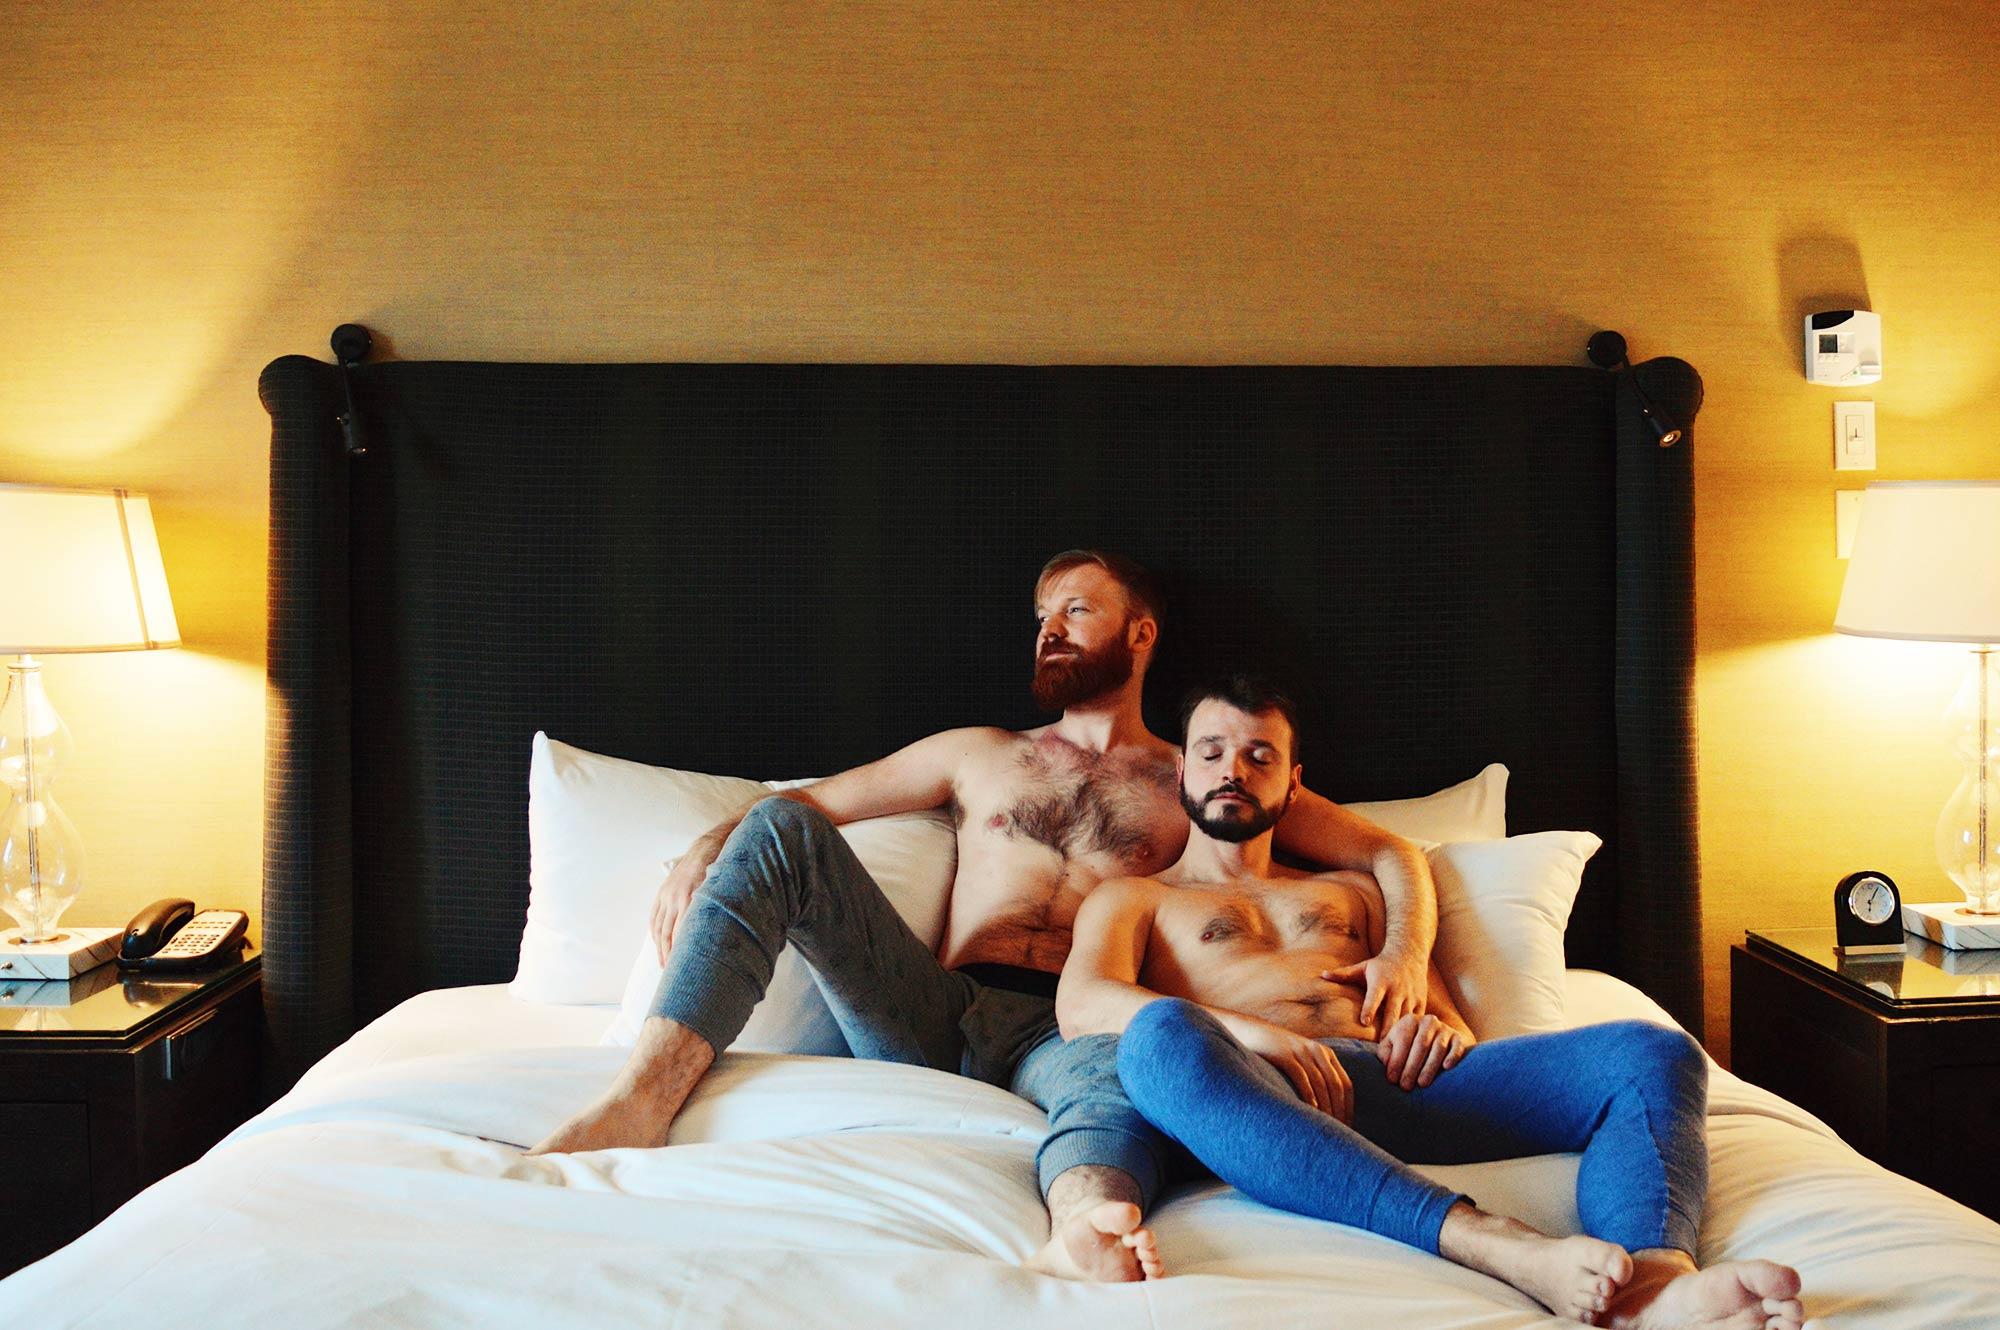 Gay hotel motel